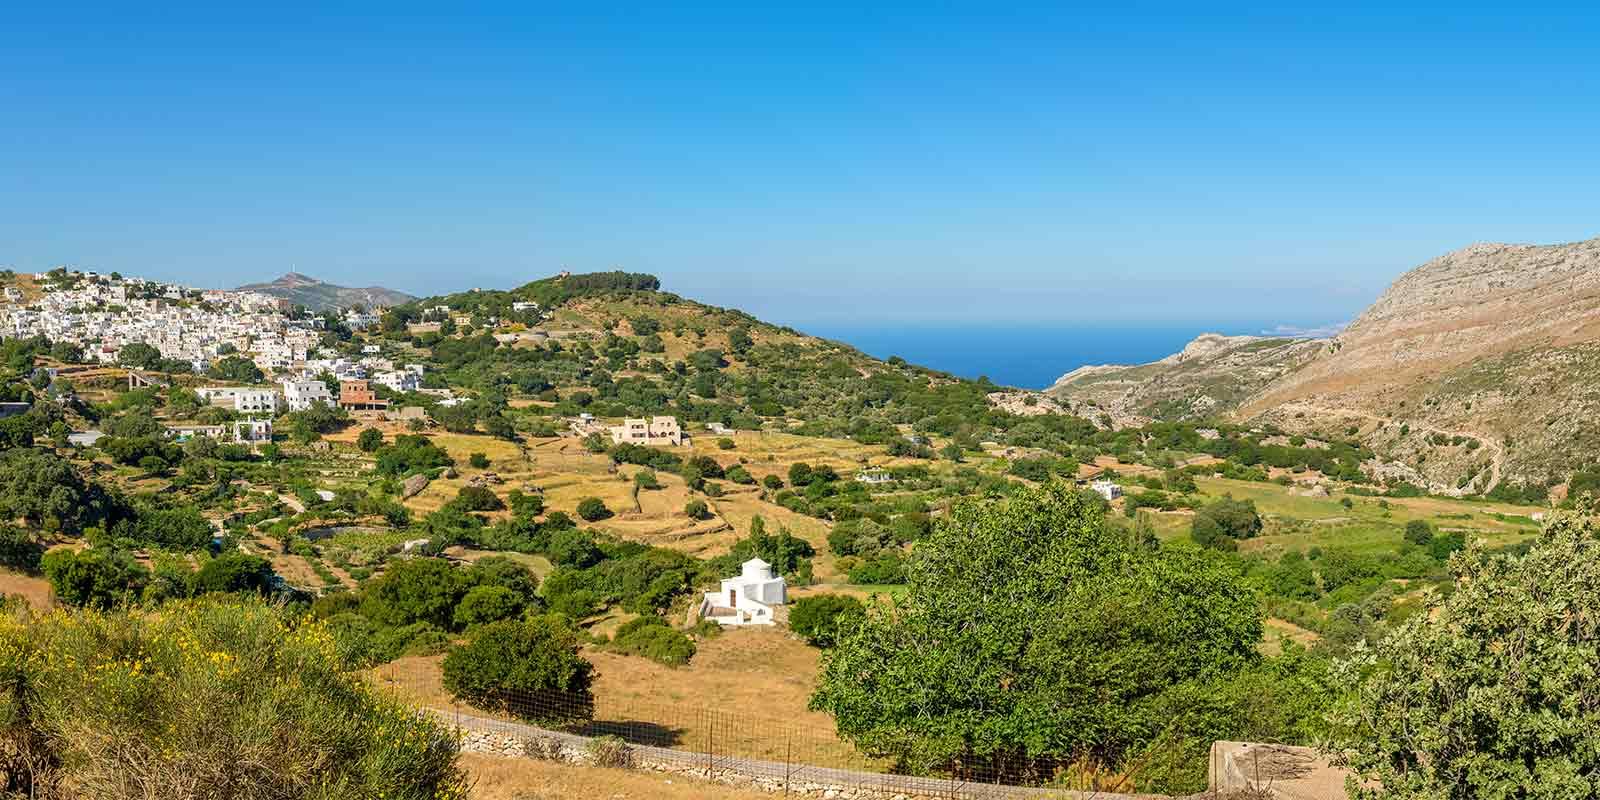 Mountain scenery on the Greek island of Naxos